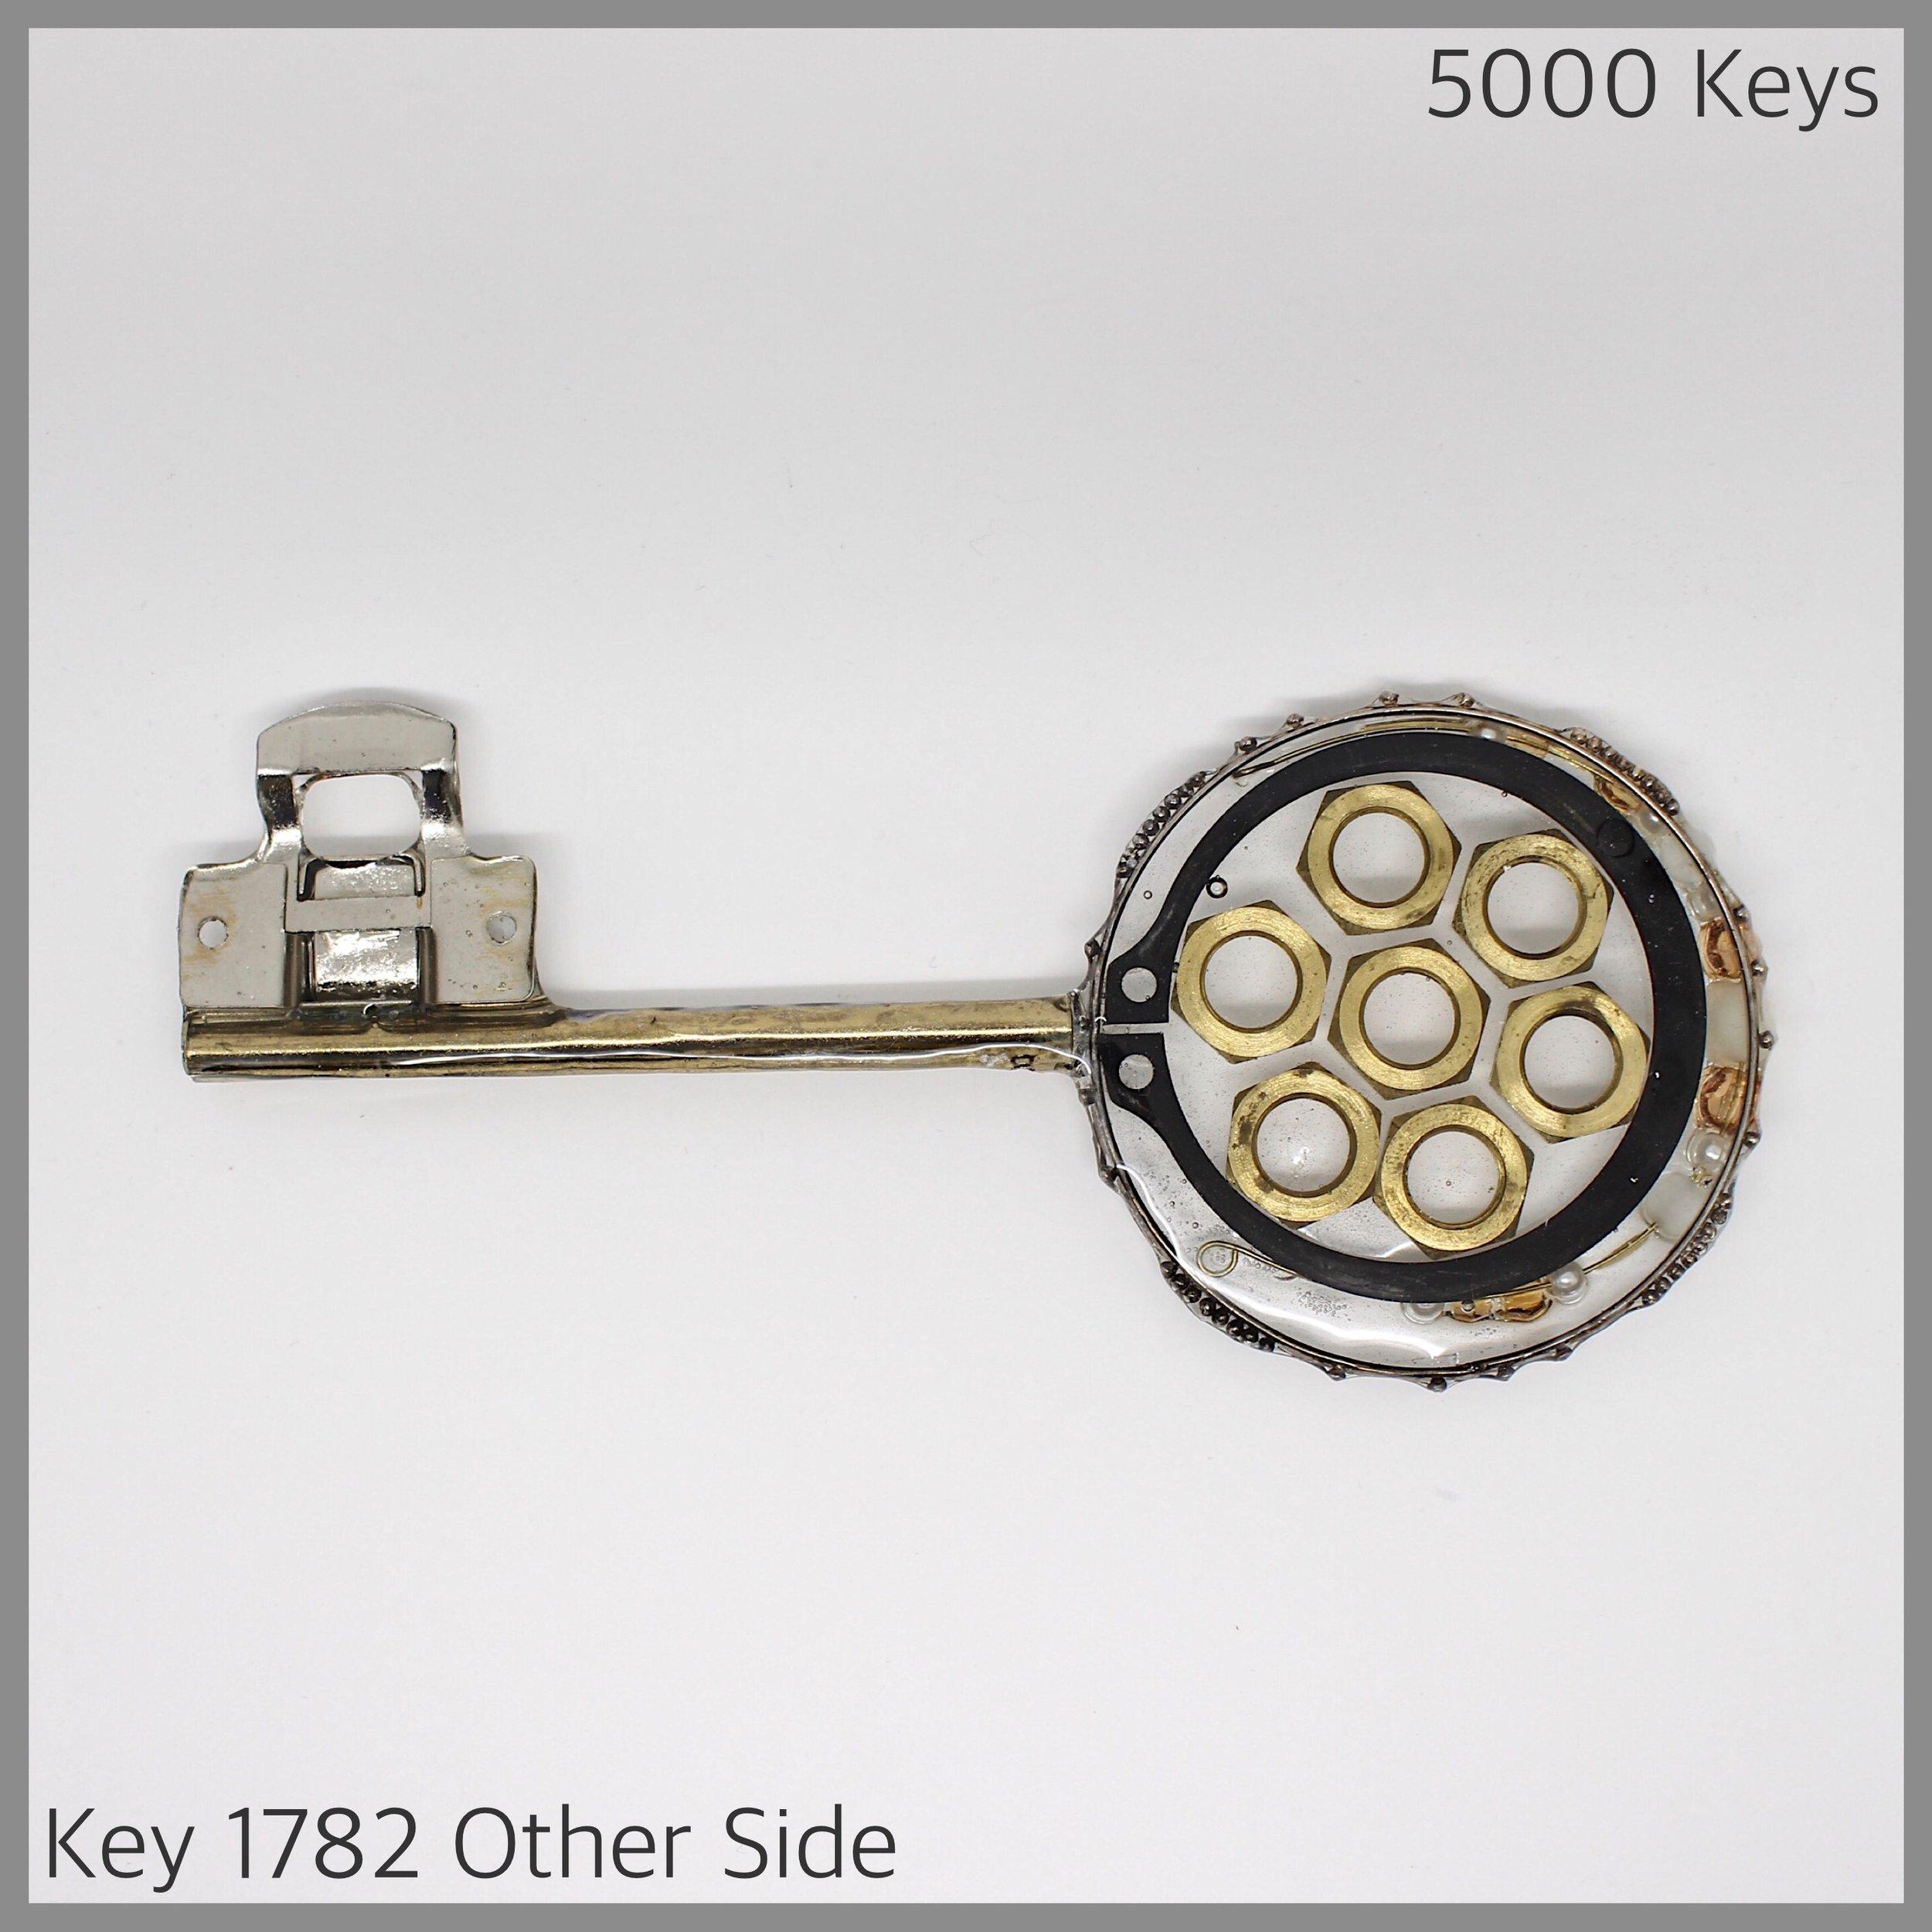 key 1782 other side - 1.JPG